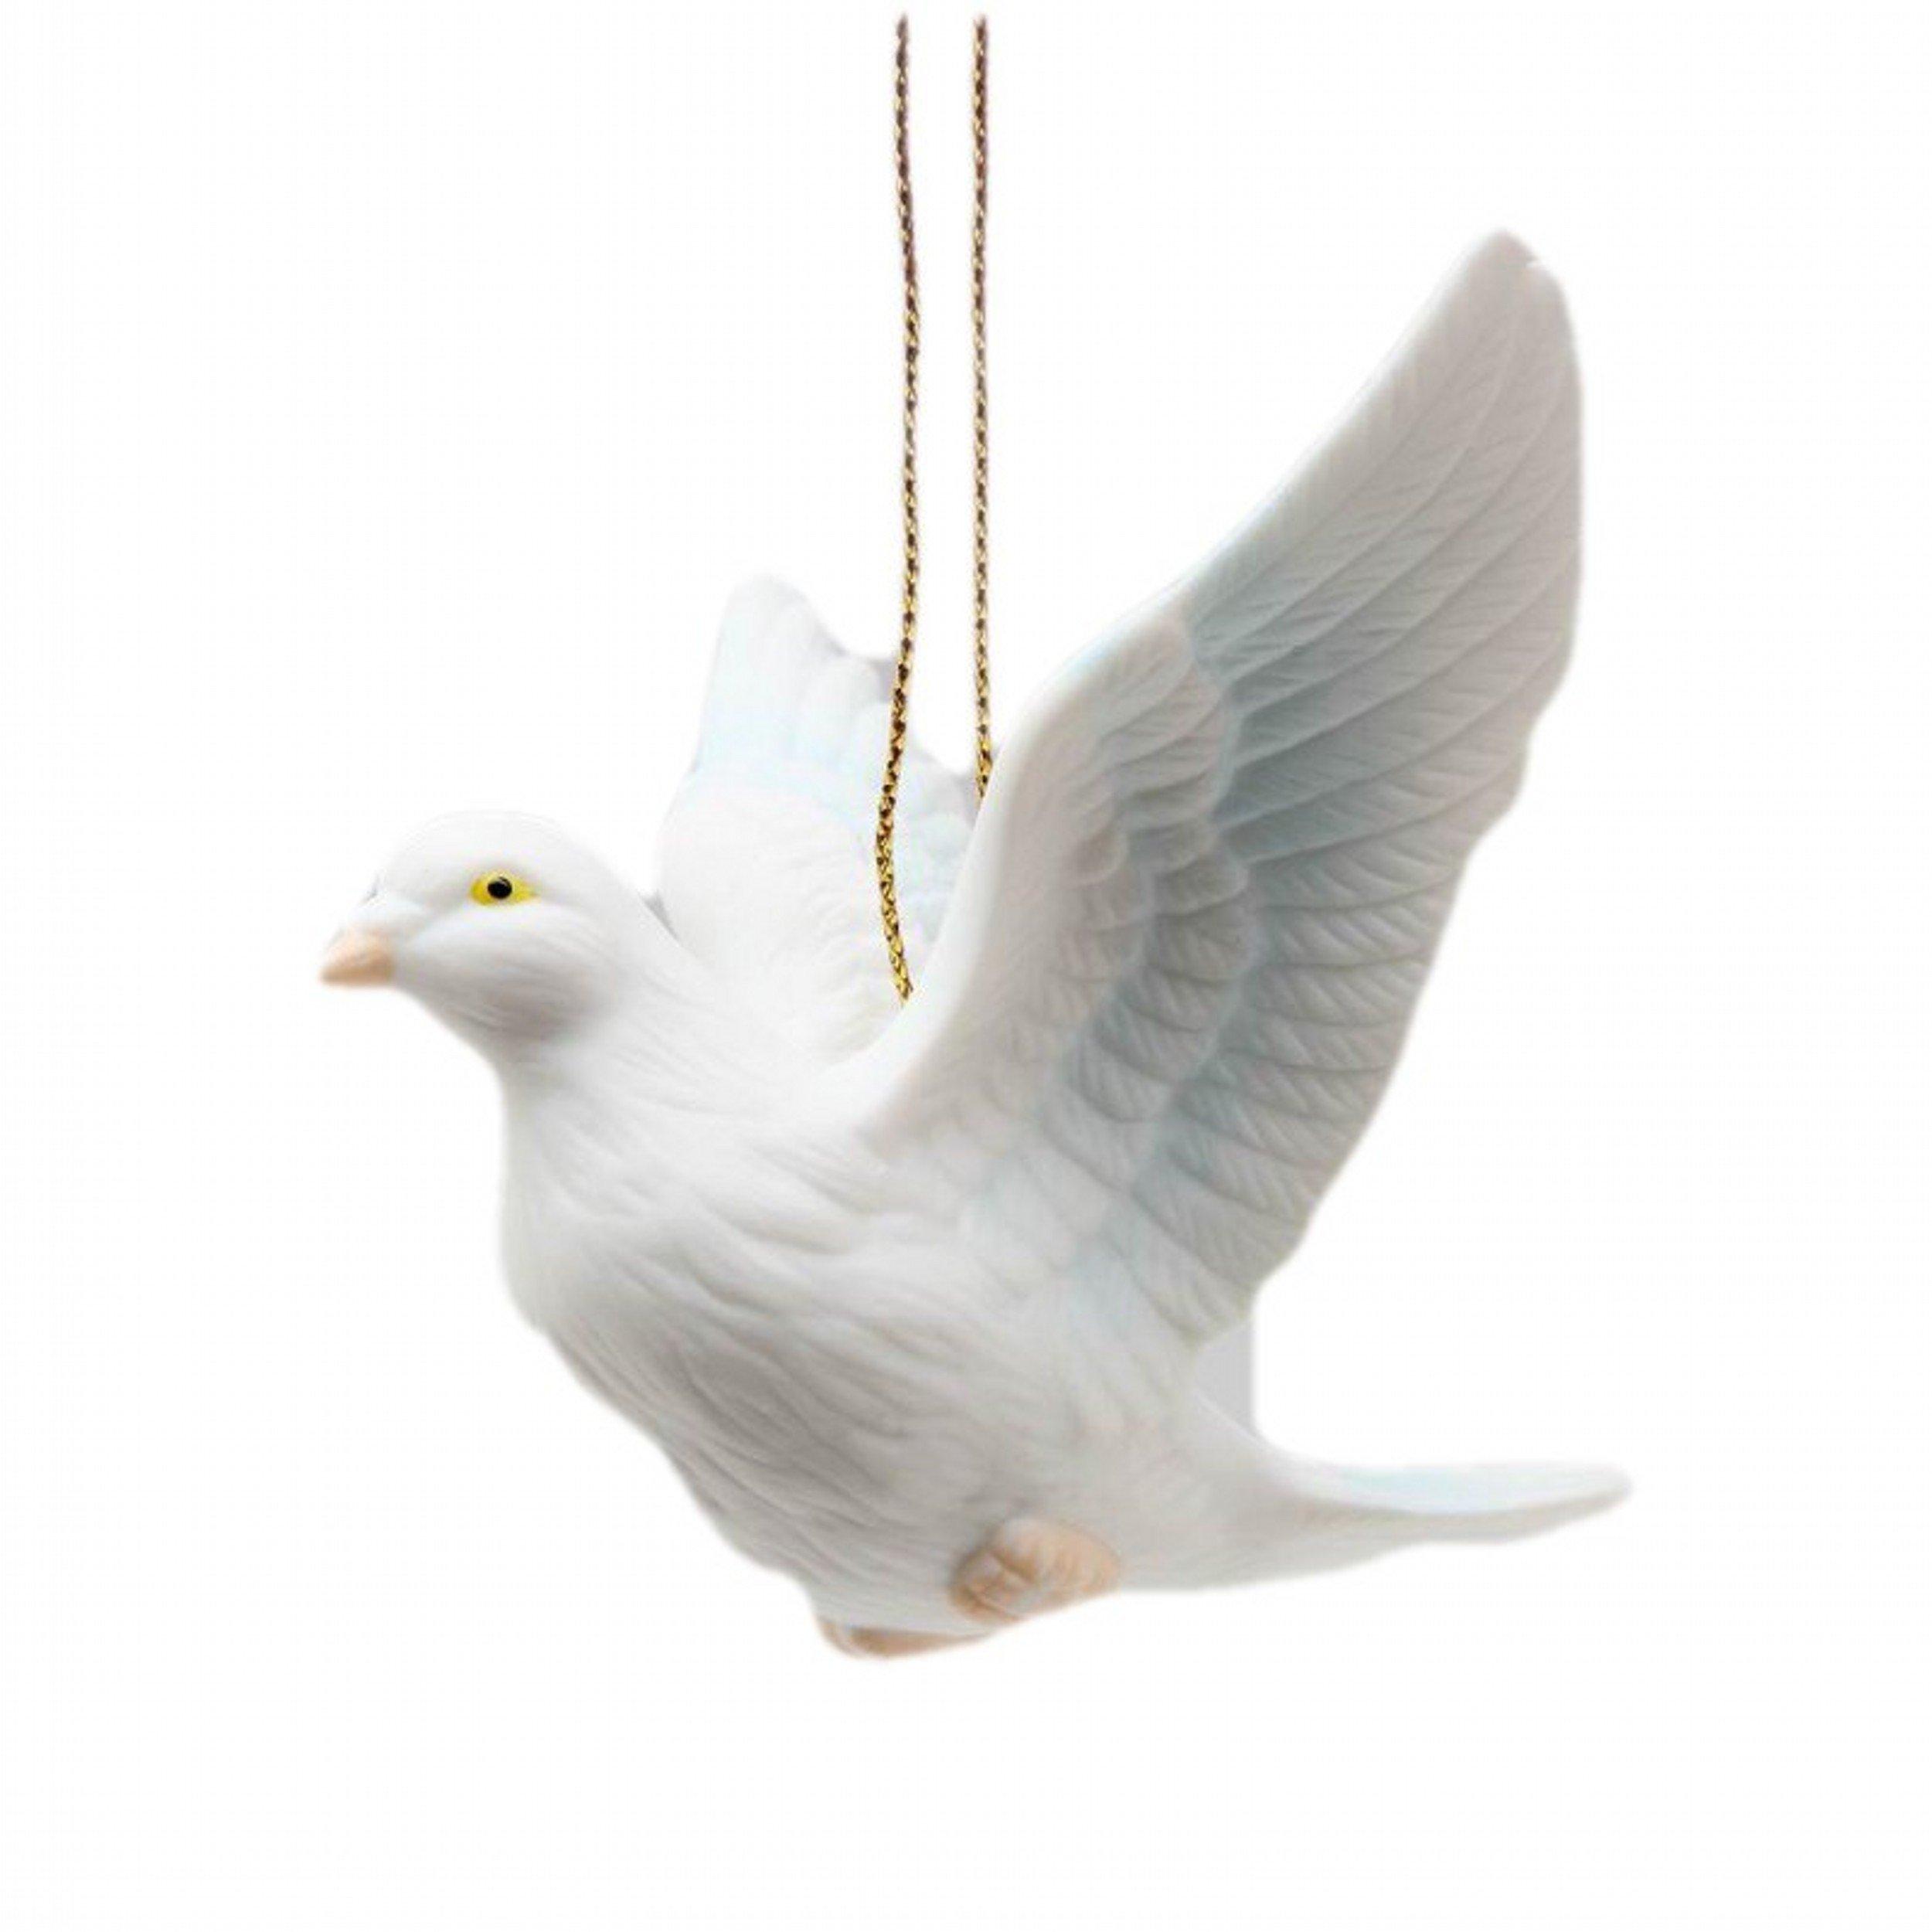 Cg B9024 3.5'' Dove Figurine Flying Christmas Ornament